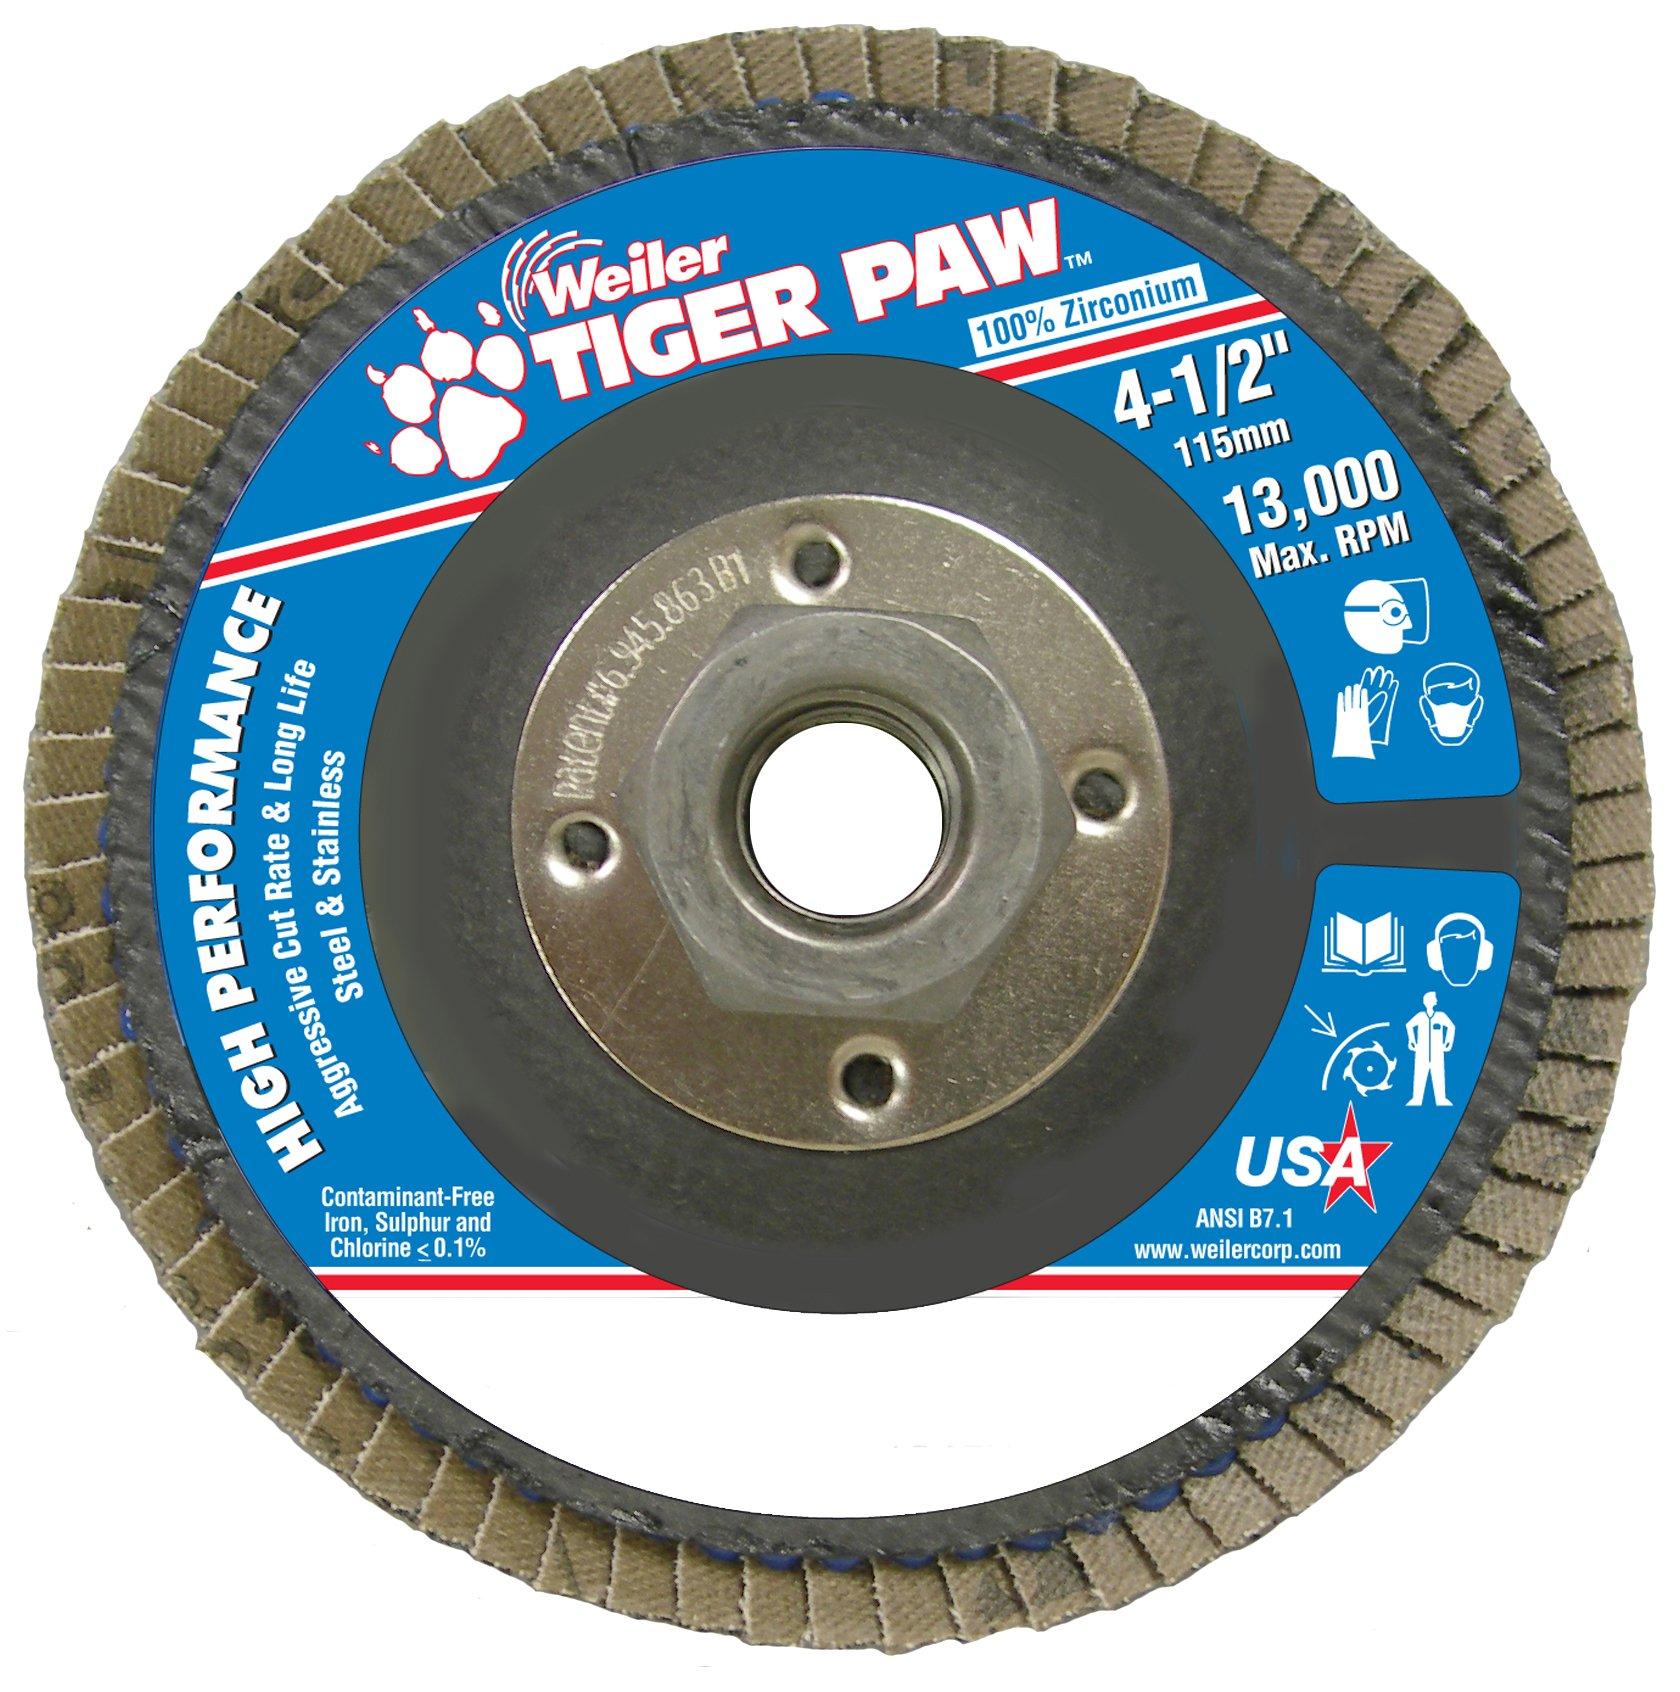 Weiler 51125 Tiger Paw High Performance Abrasive Flap Disc, Type 29 Angled Style, Phenolic Backing, Zirconia Alumina, 4-1/2'' Diameter, 5/8''-11 Arbor, 60 Grit, 13000 RPM (Pack of 10)